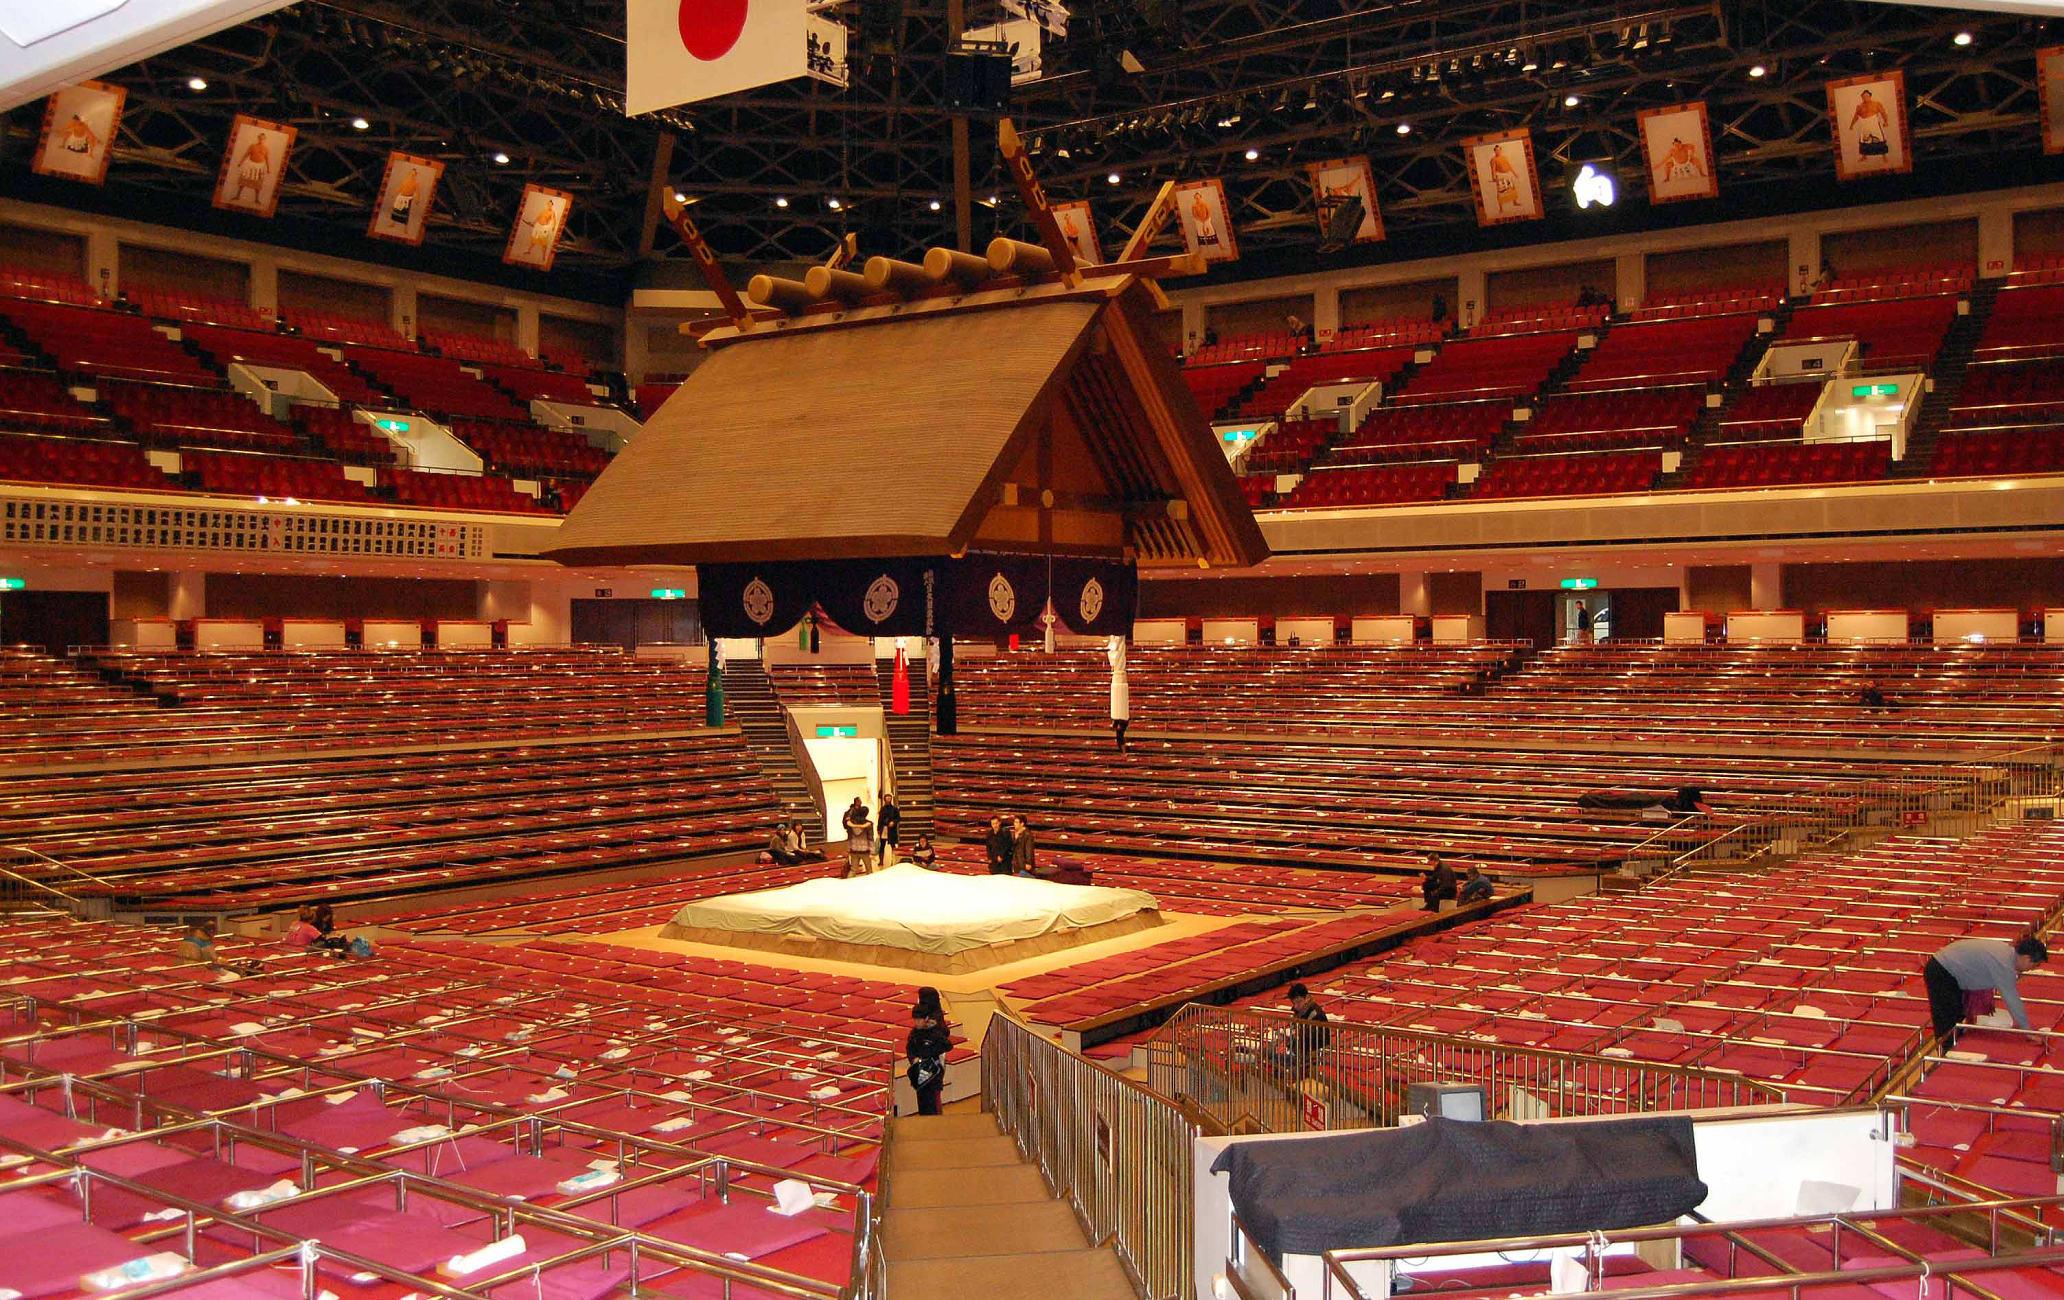 Interior Ryogoku Sumo Stadium Tokyo